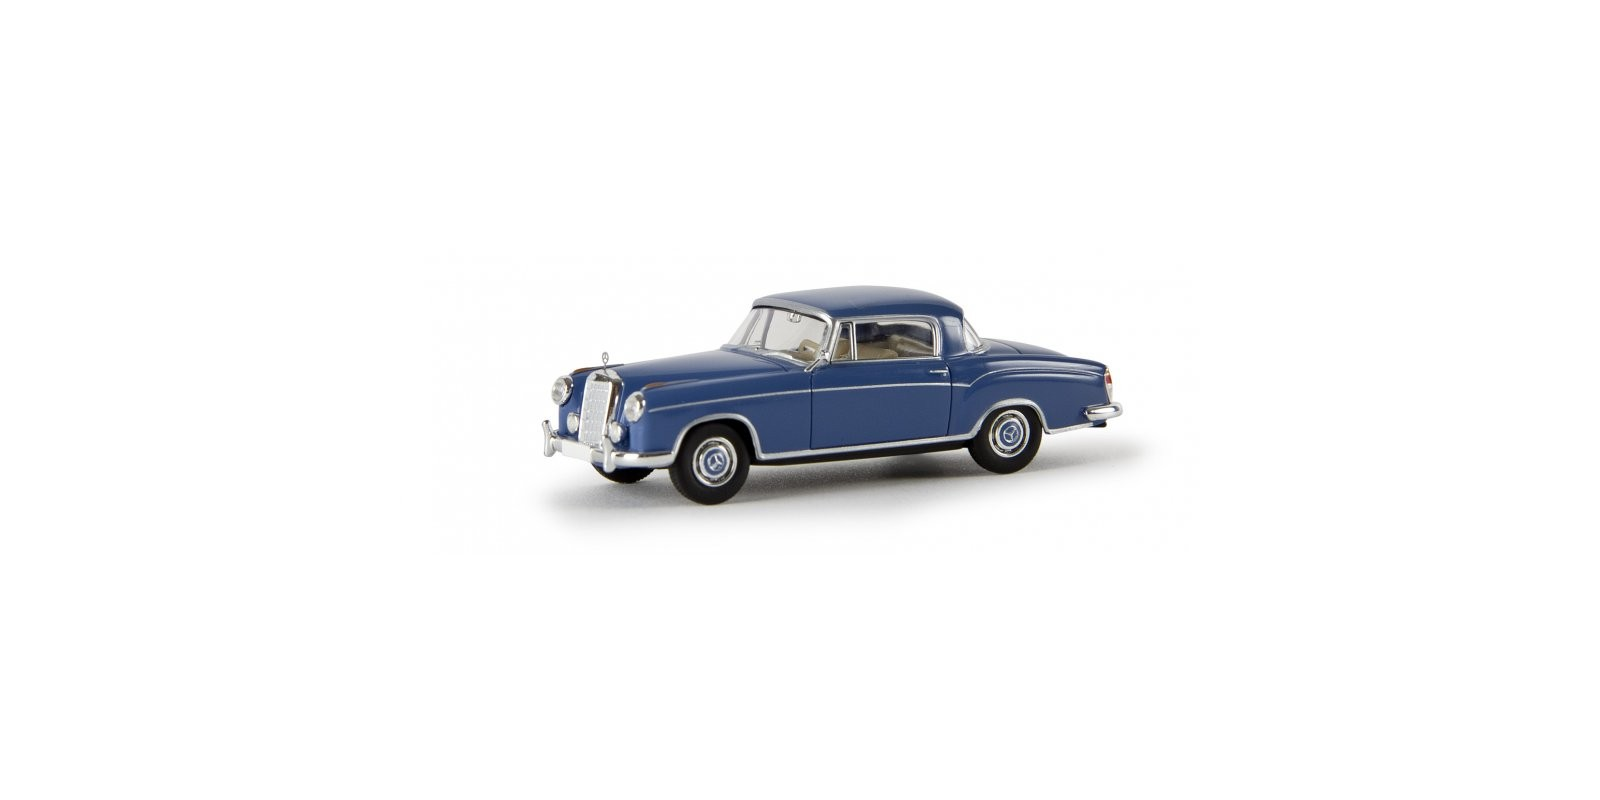 BK13503 MB 220 S Coupe, fernblau